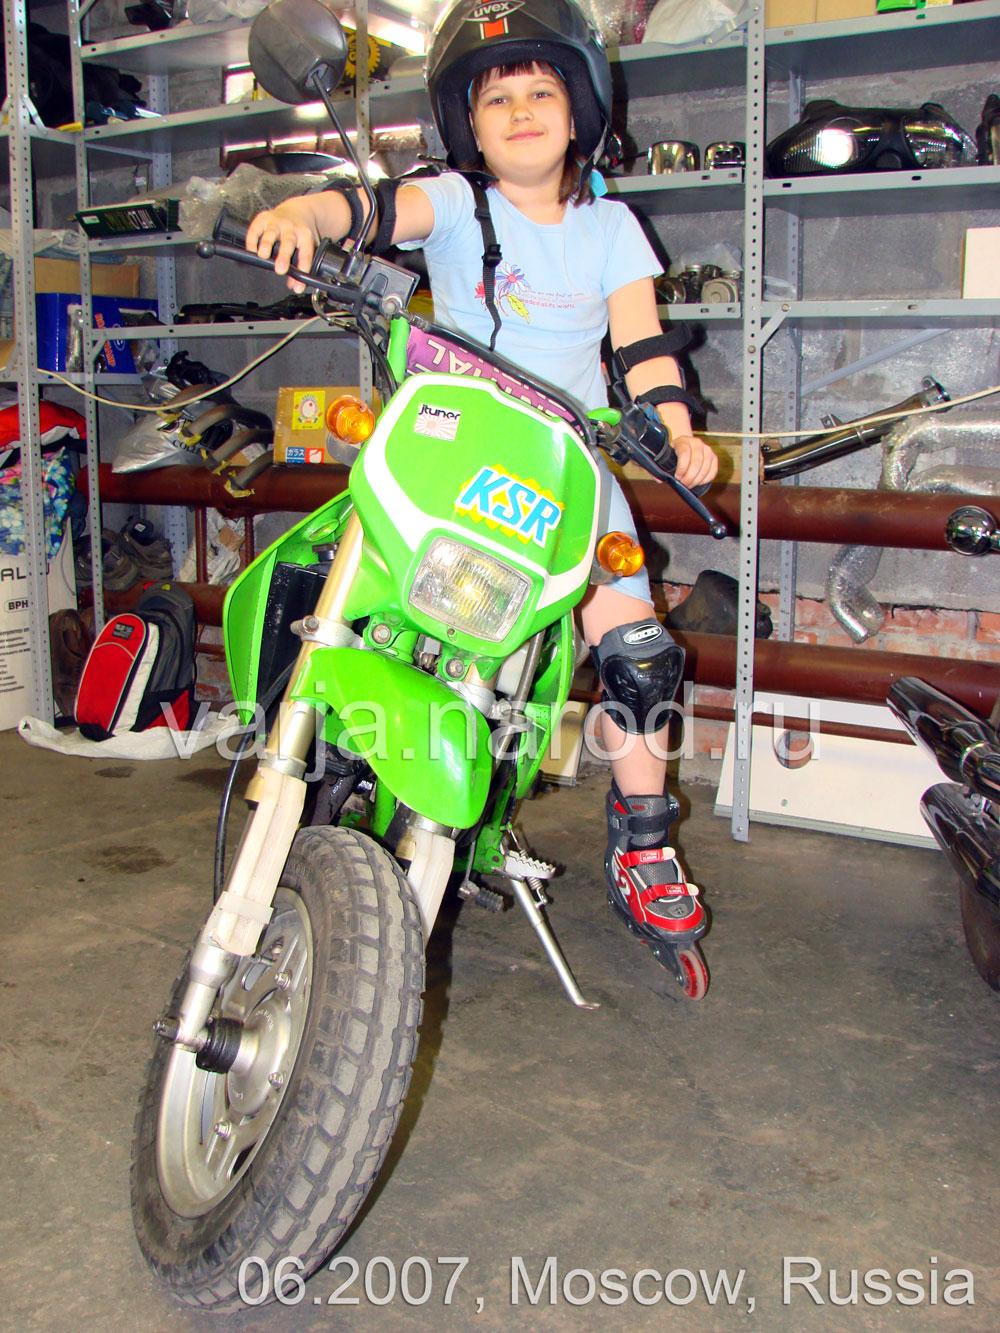 Фото с детьми на мотоцикле